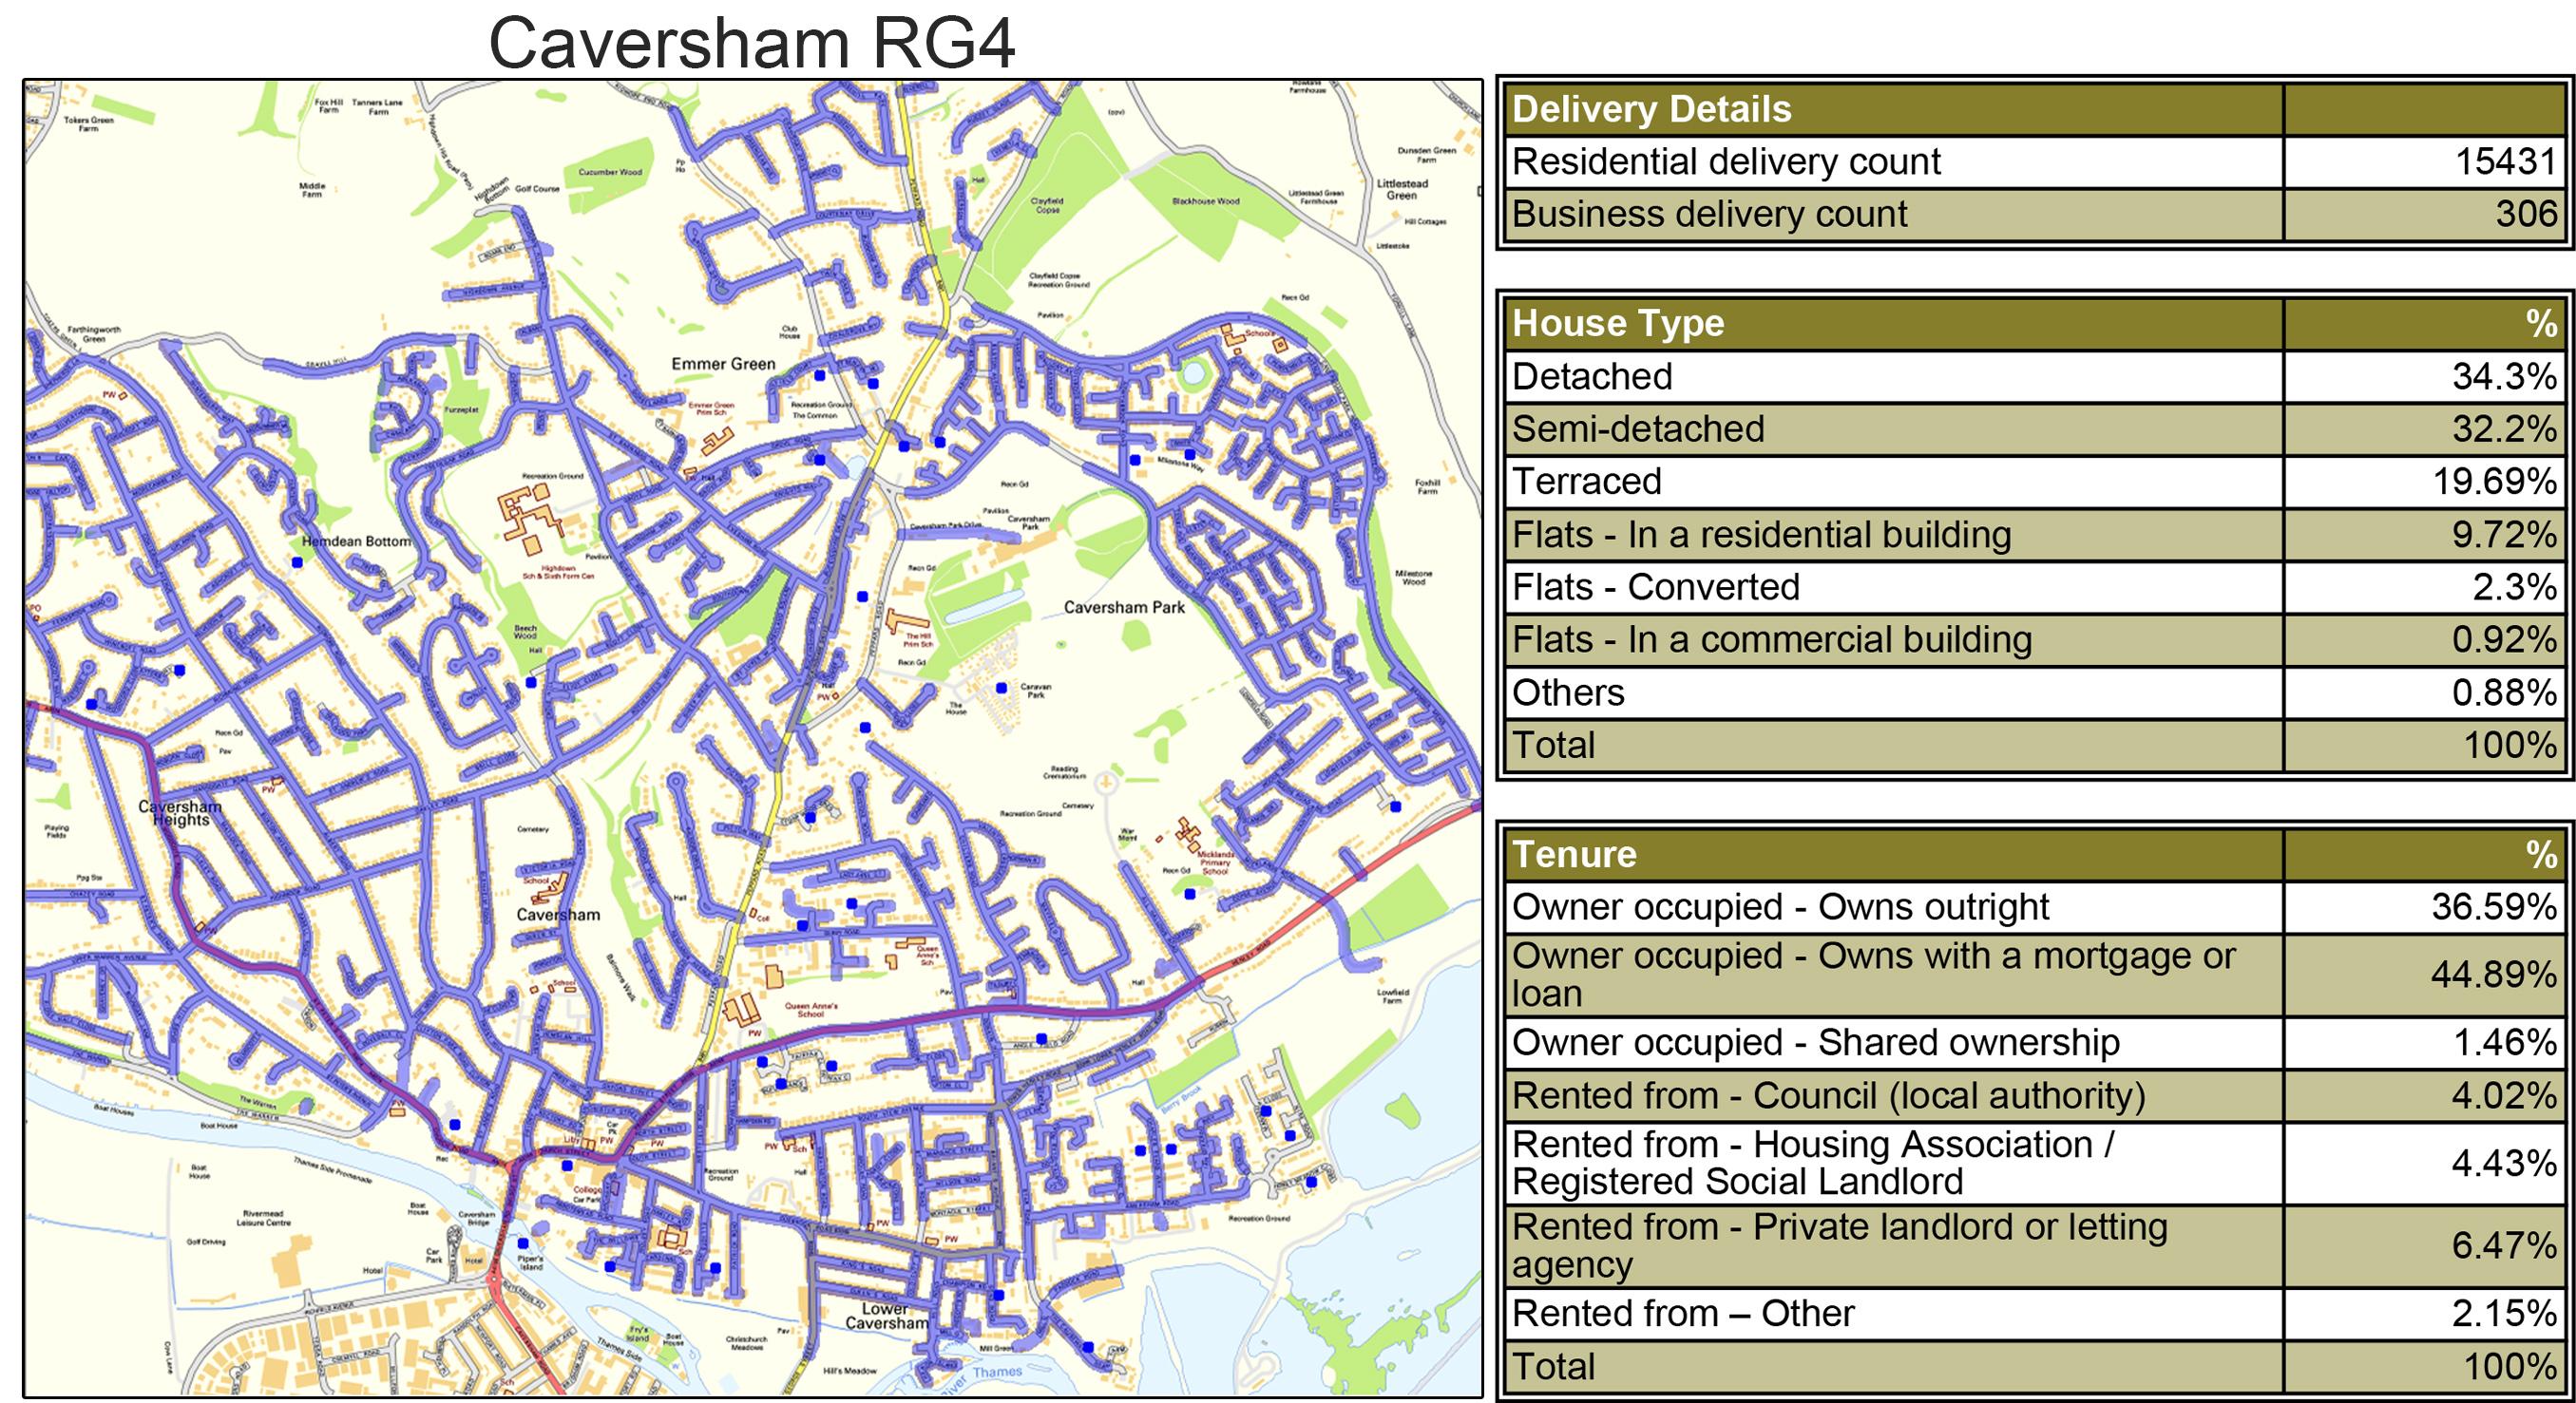 Geoplan image of Leaflet Distribution Caversham